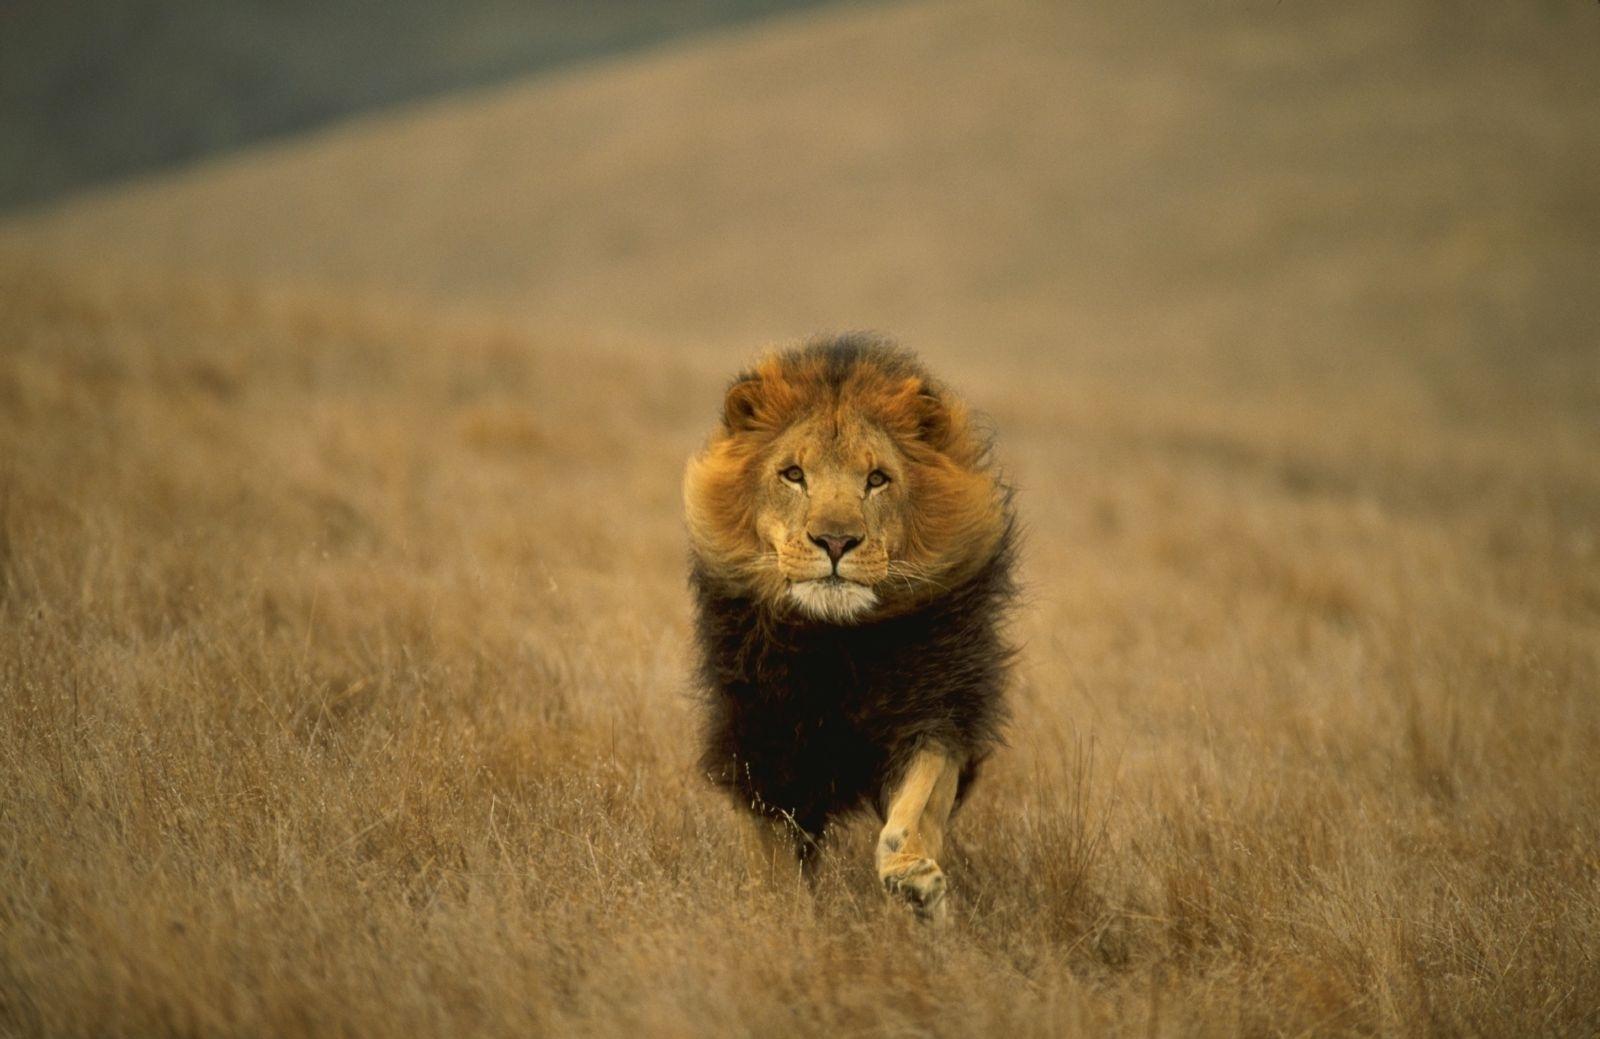 Lion Hd Background , HD Wallpaper & Backgrounds